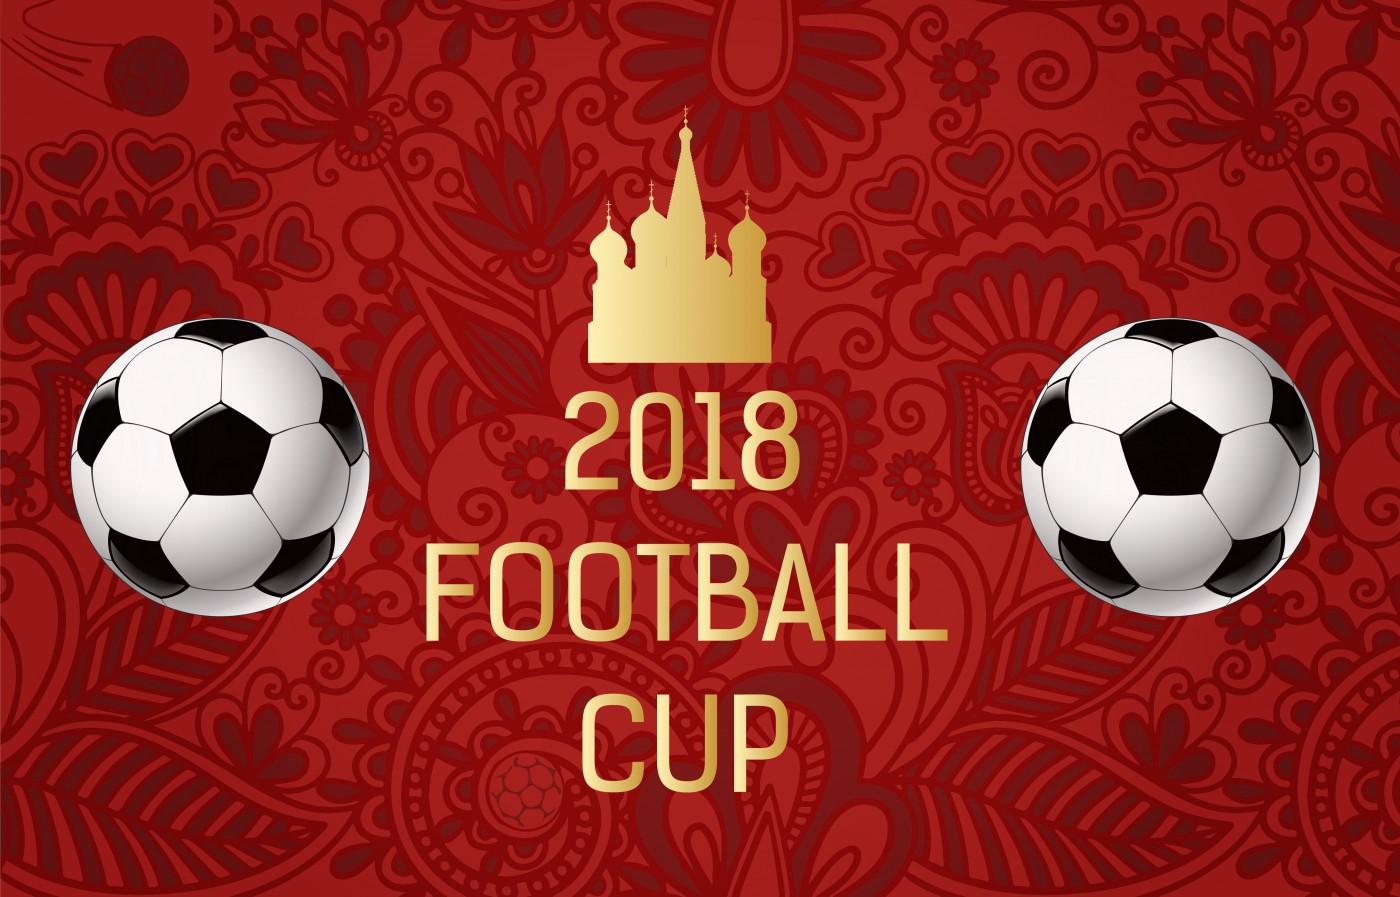 2018 FIFA足球賽踢出Twitter大訂單,緯創小金雞緯穎迎接拉貨狂潮